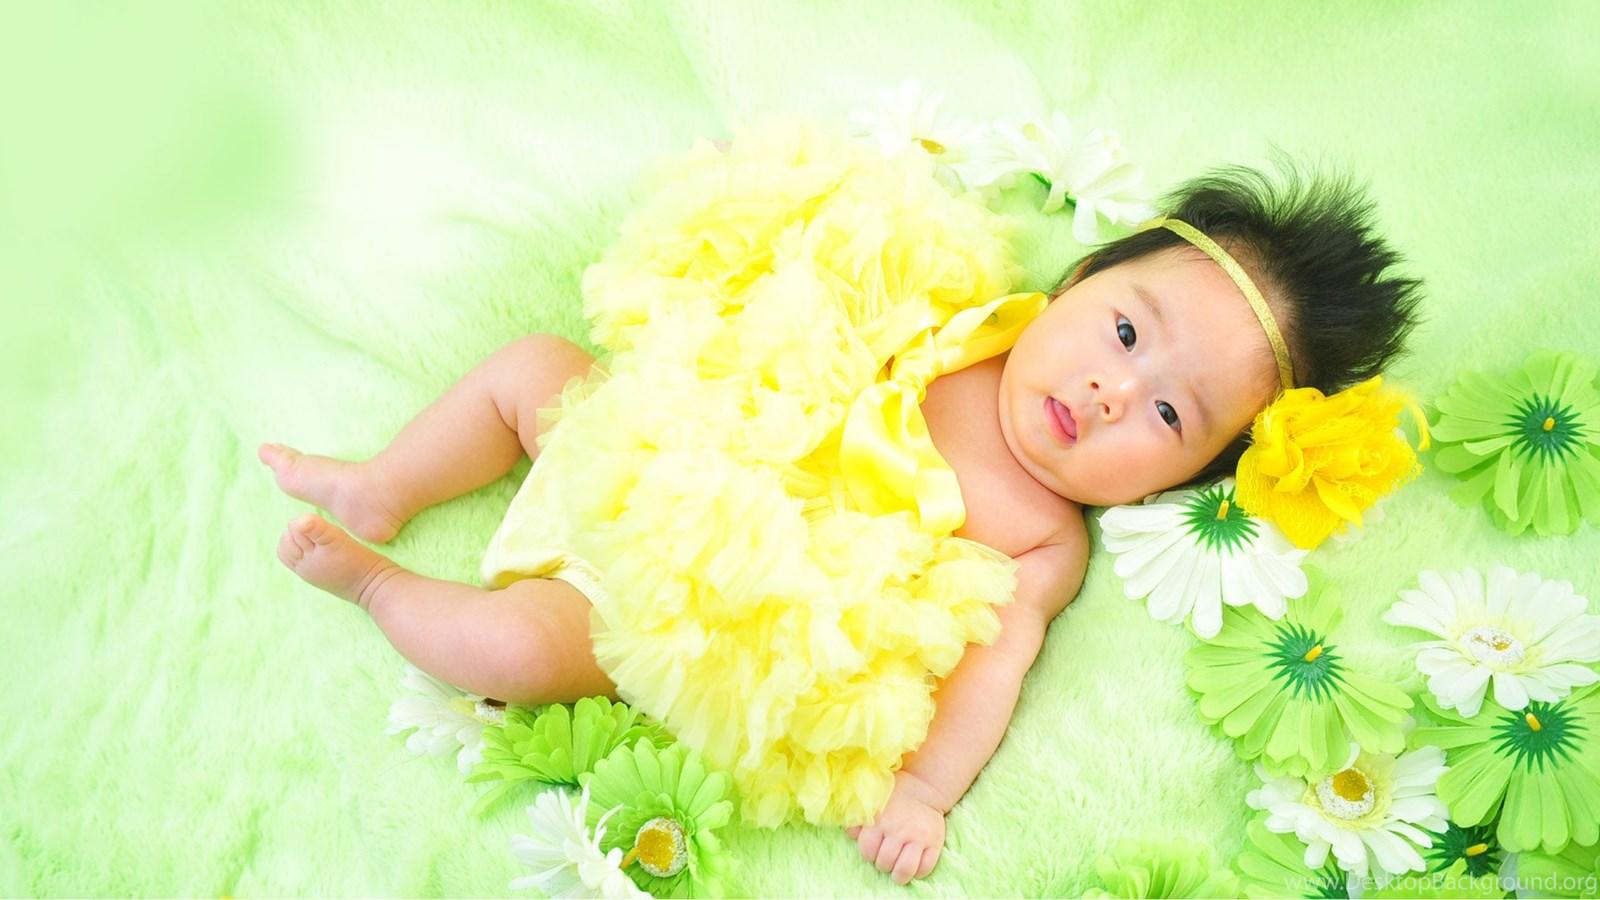 beautiful cute baby hd wallpapers desktop background